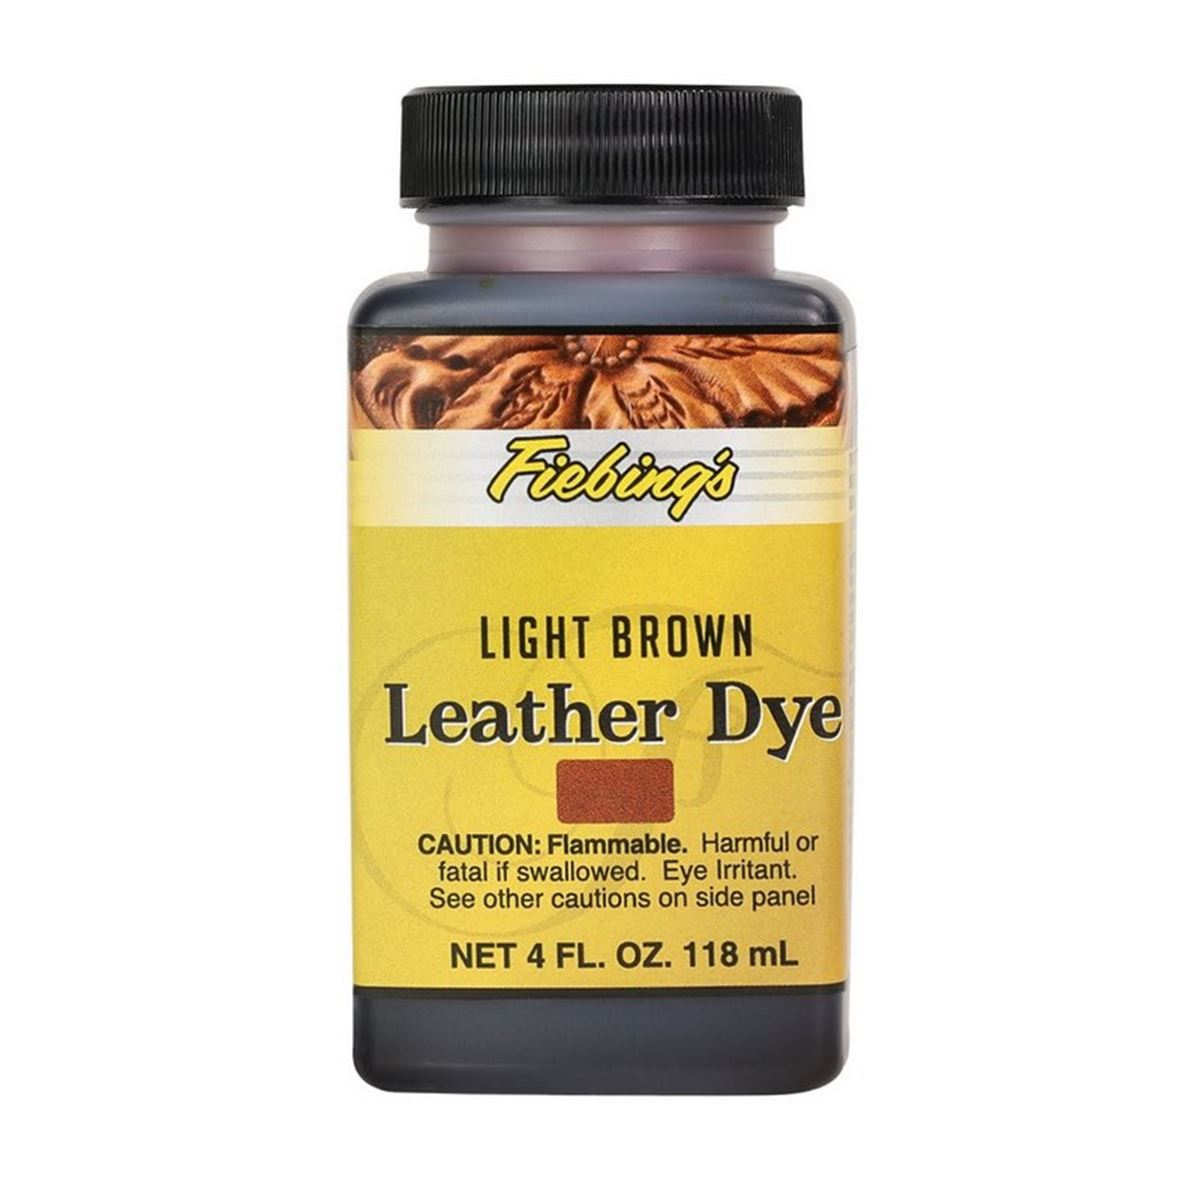 Teinture pour cuir - Fiebing's Leather dye - 118ml